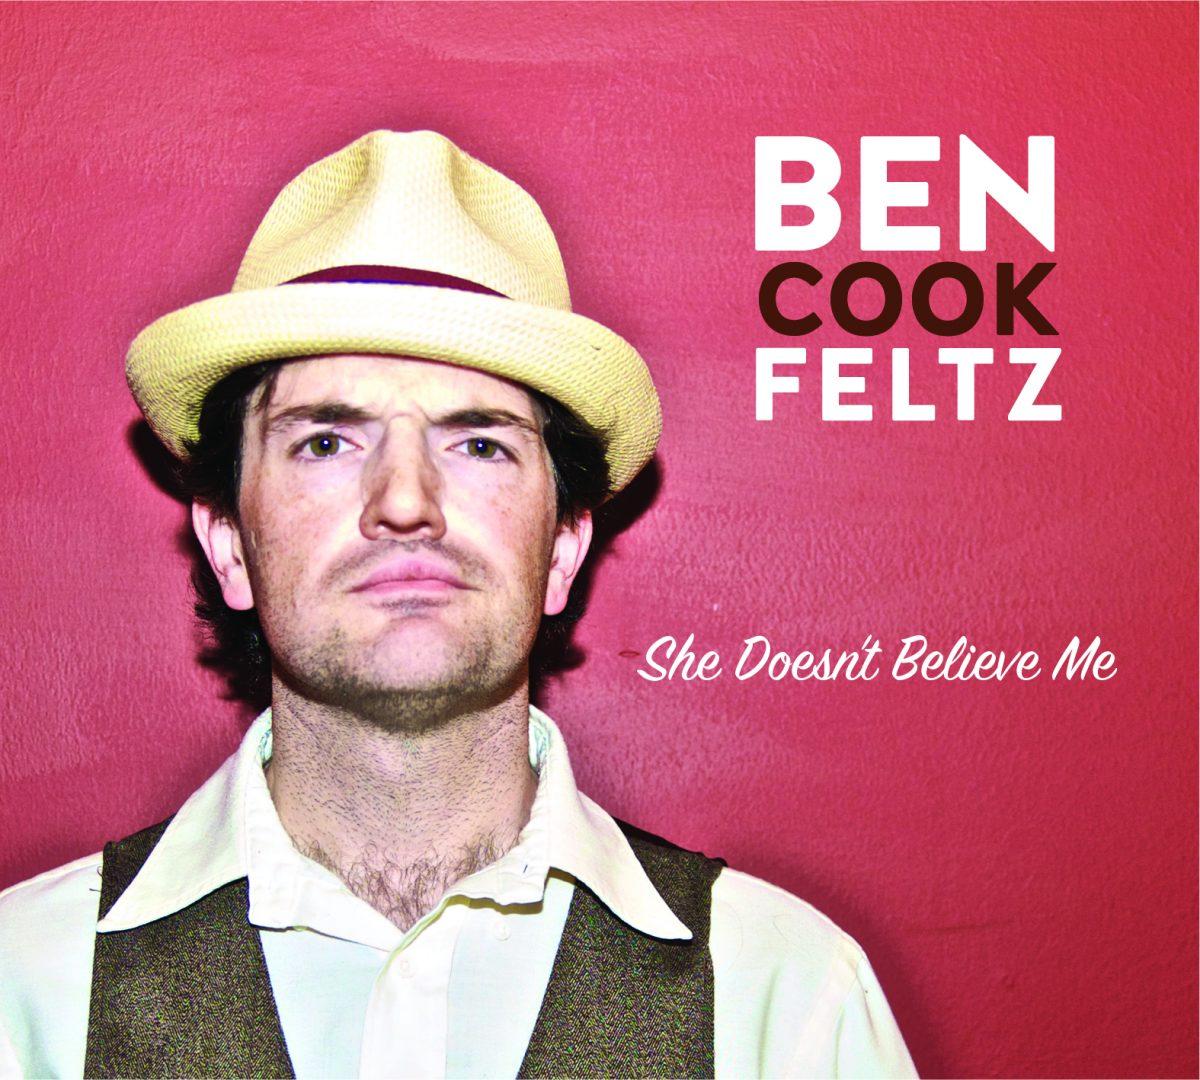 Ben Cook-Feltz - She Doesn't Believe Me Album Art